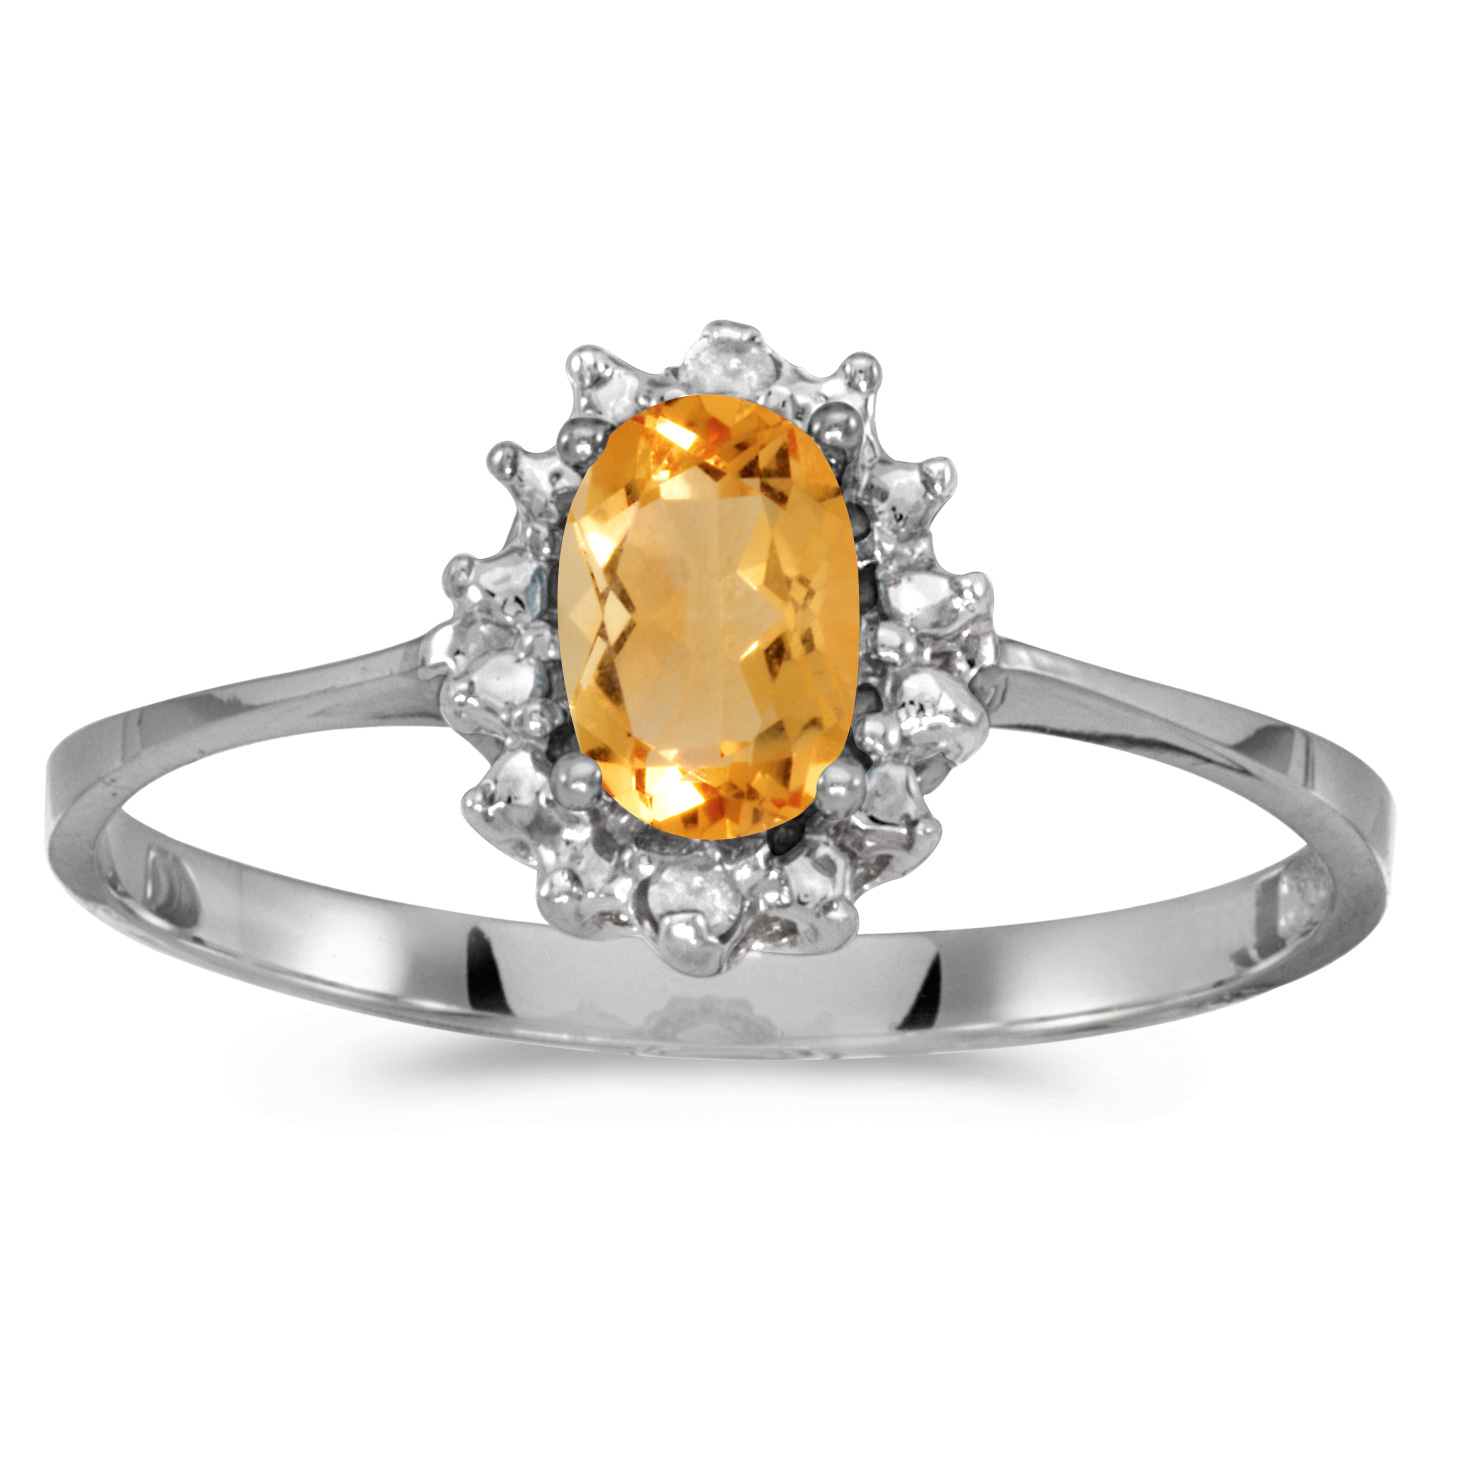 10k White Gold Oval Citrine And Diamond Ring